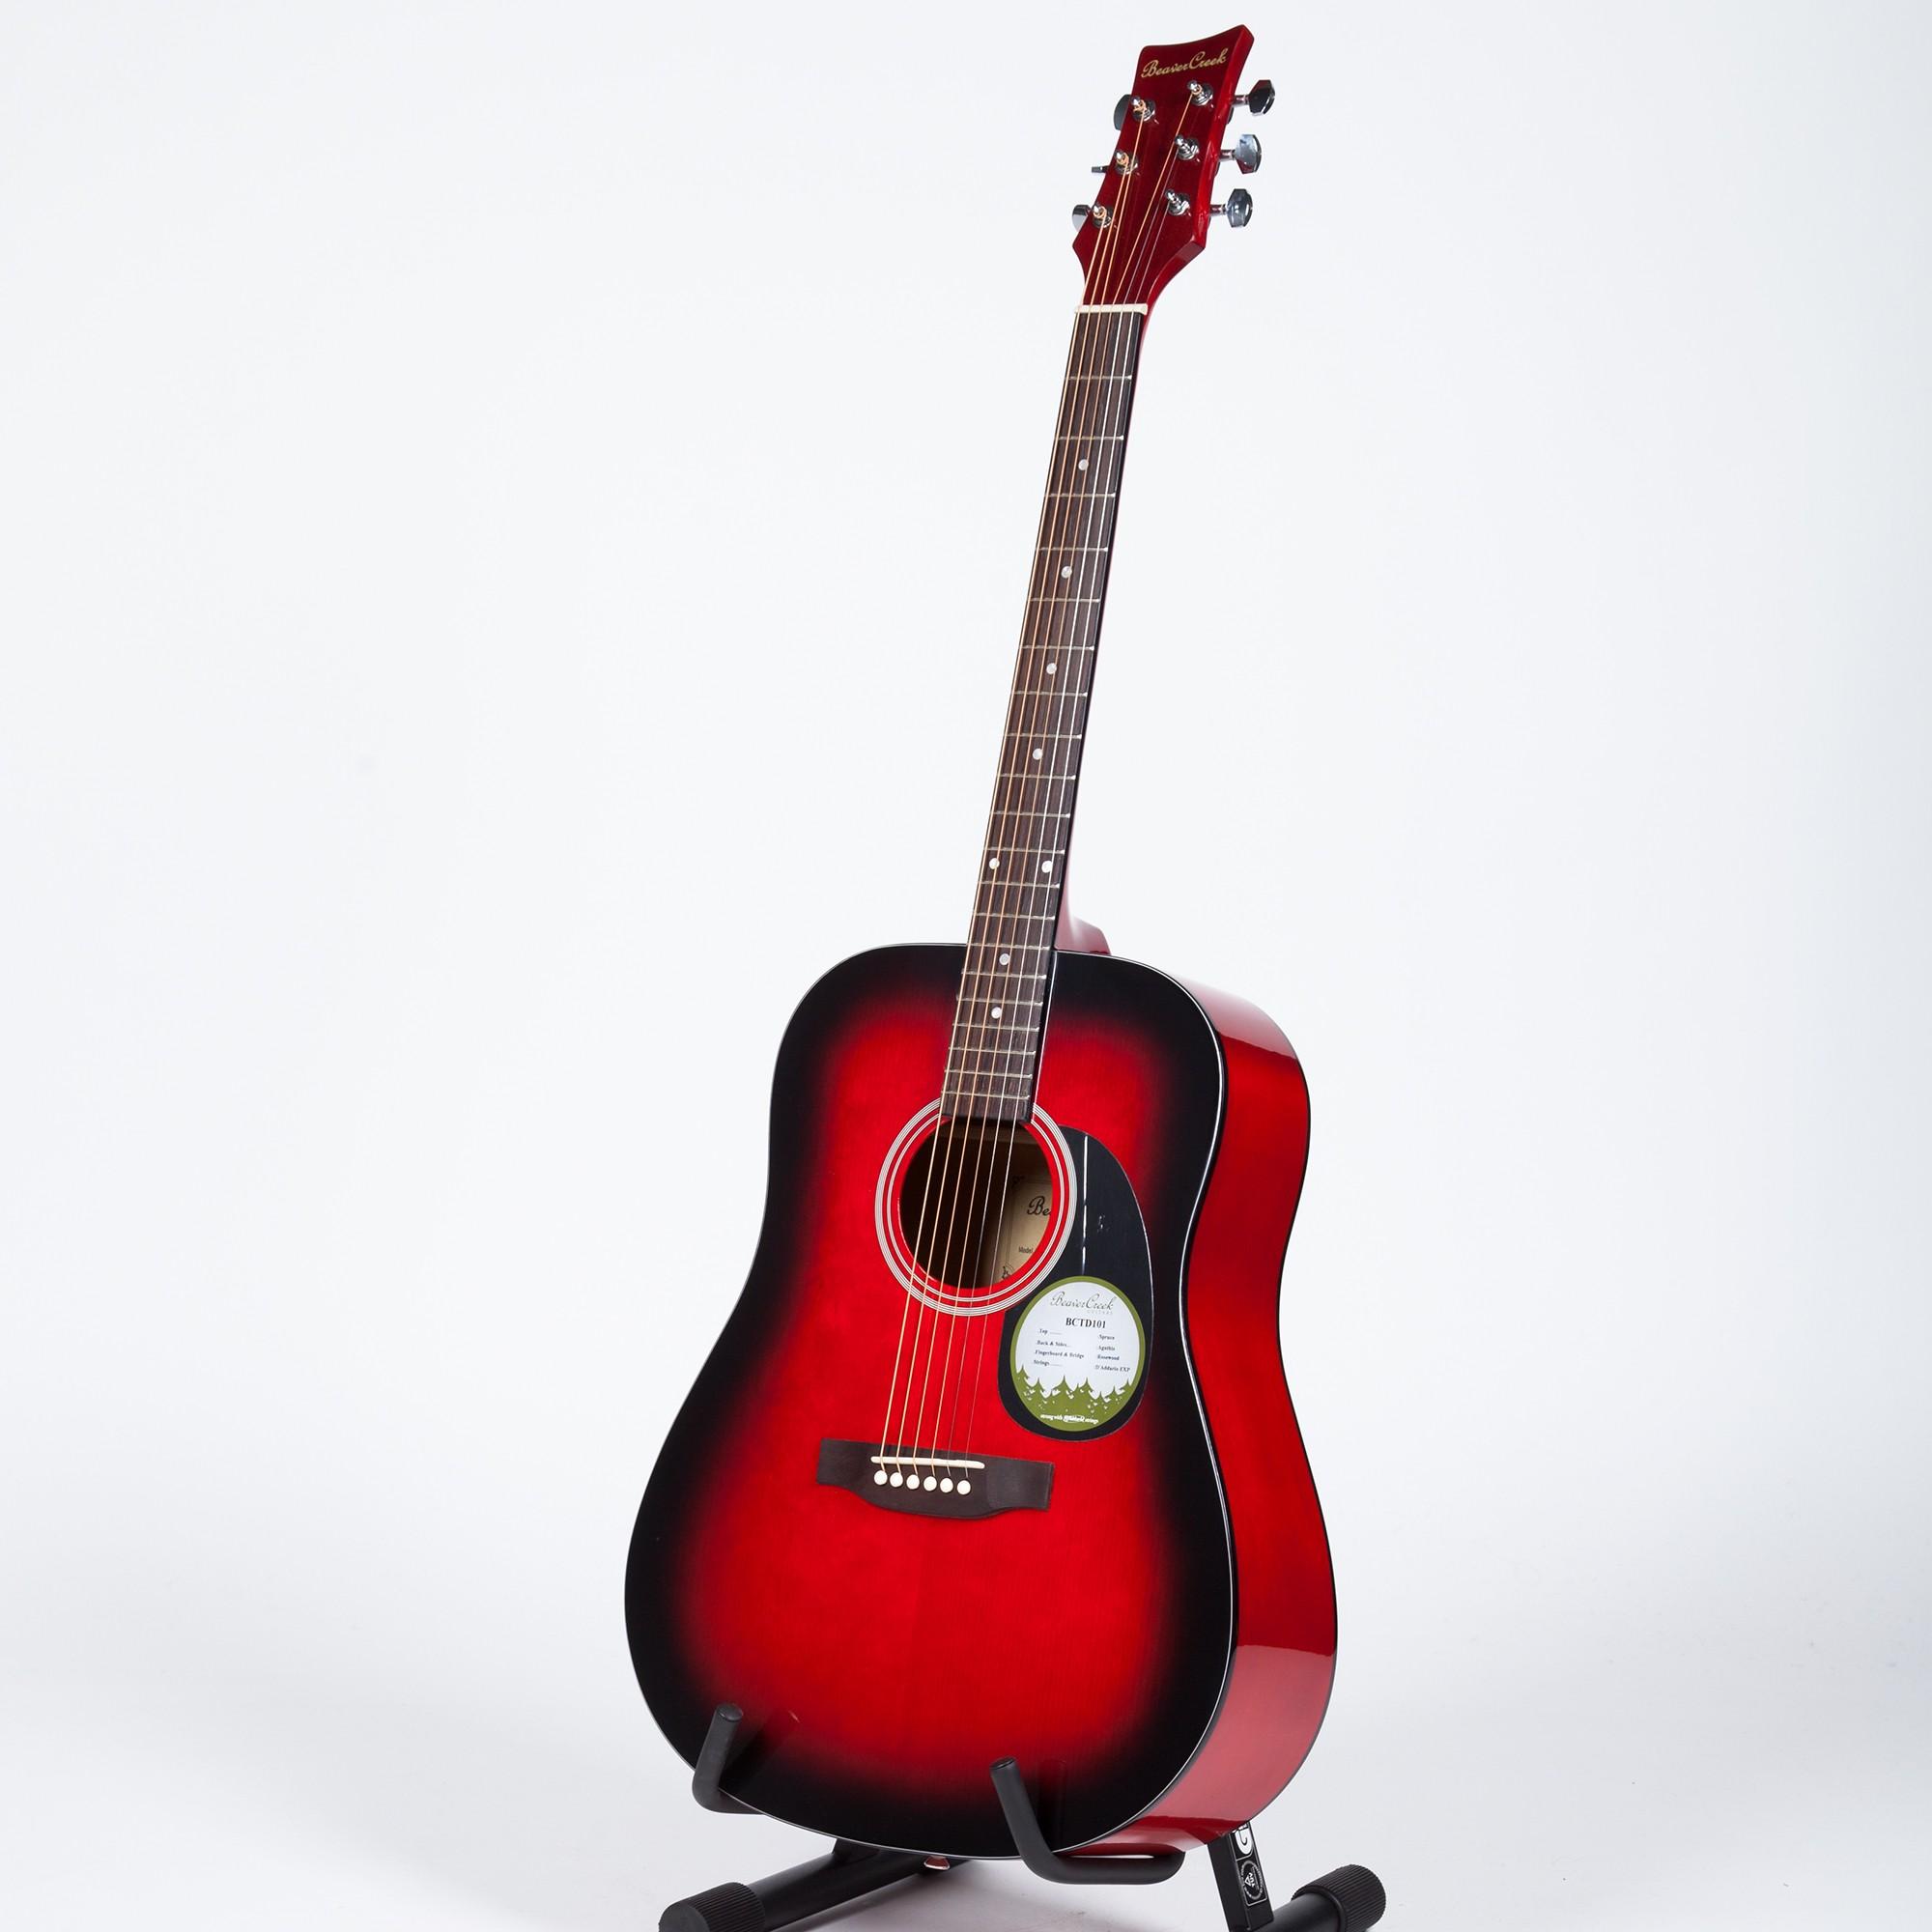 Beats clipart guitar string BeaverCreek BCTD101 BeaverCreek Acoustic Redburst